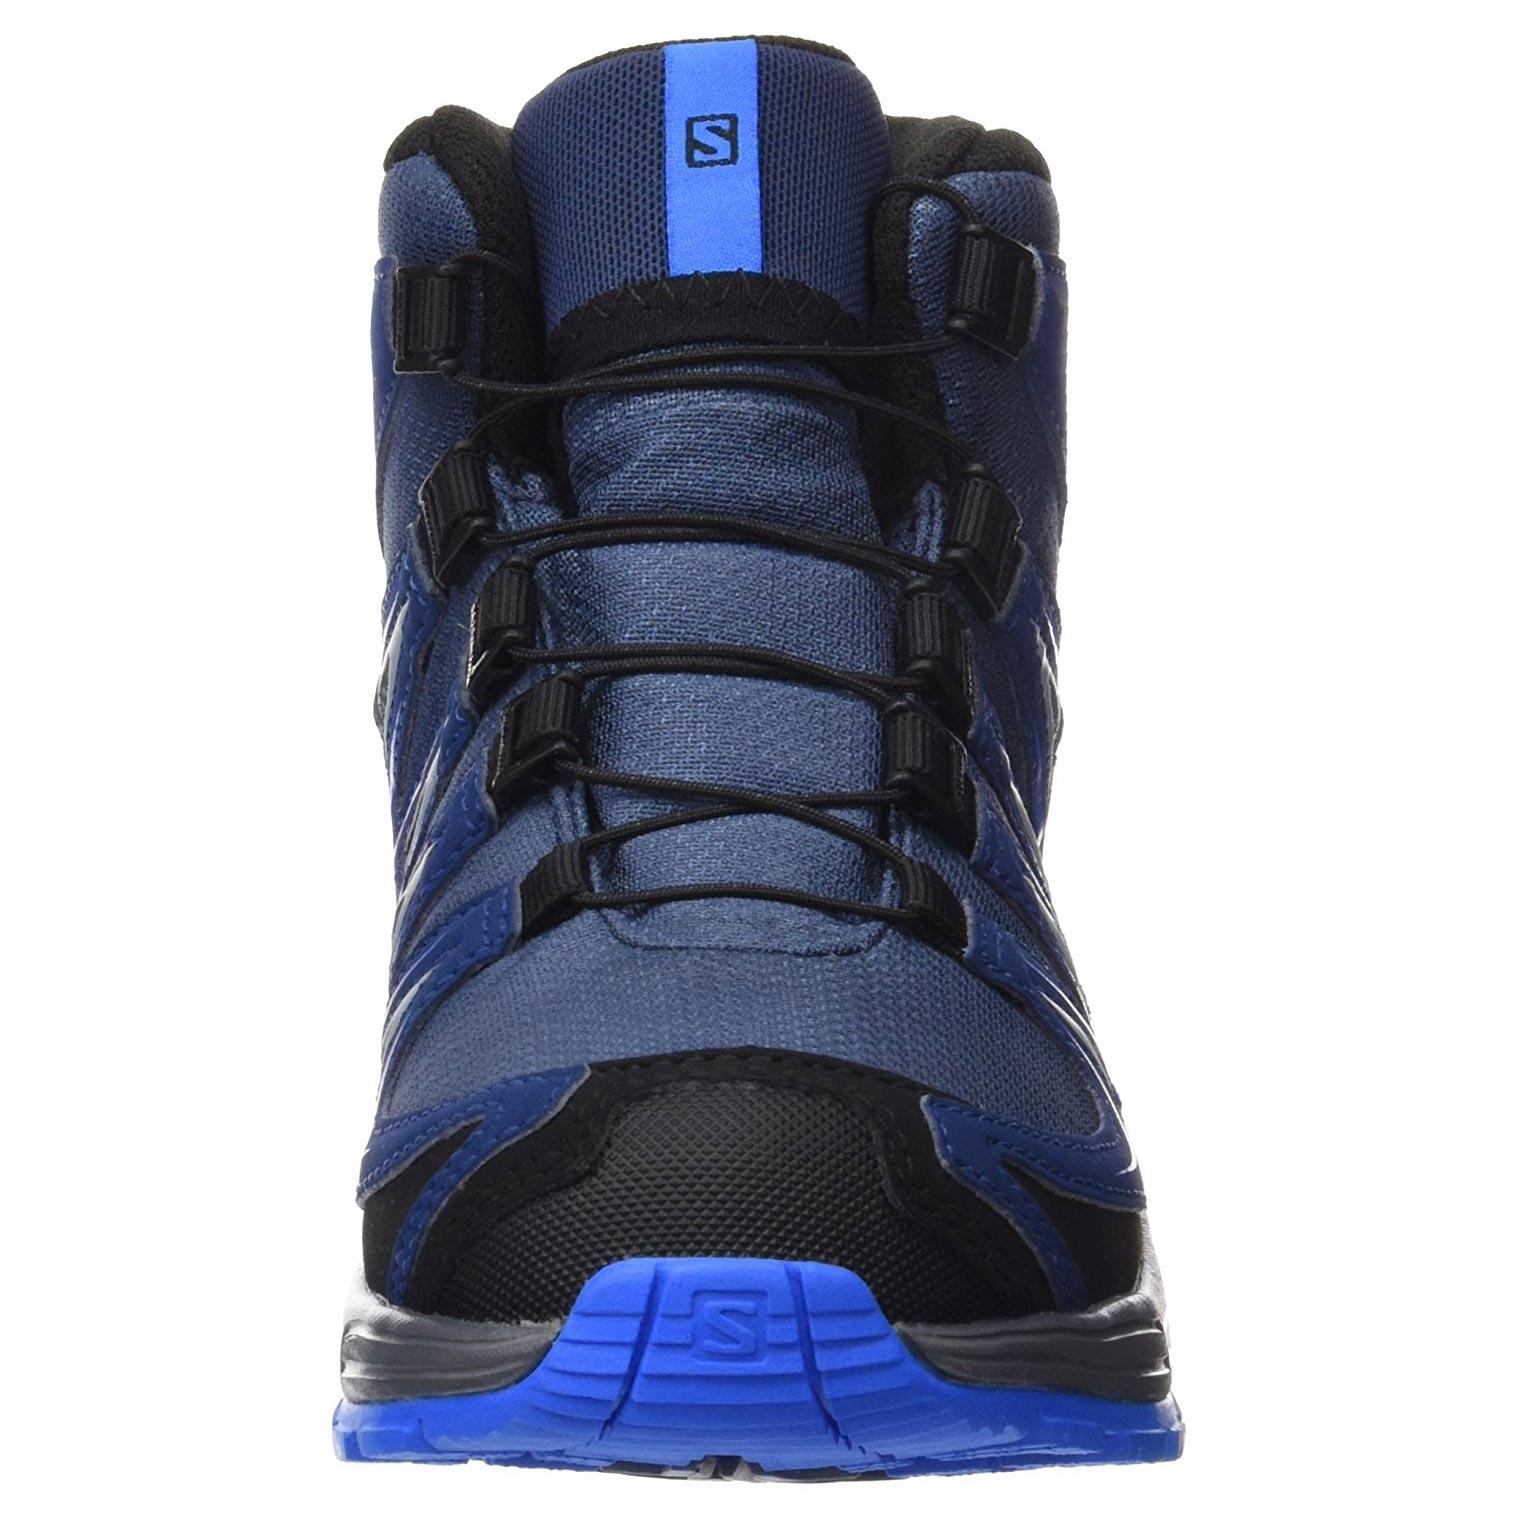 908d966c96 ... Bota Salomon XA PRO 3D MID CSWP J Marino/Azul/Negro, Img 7